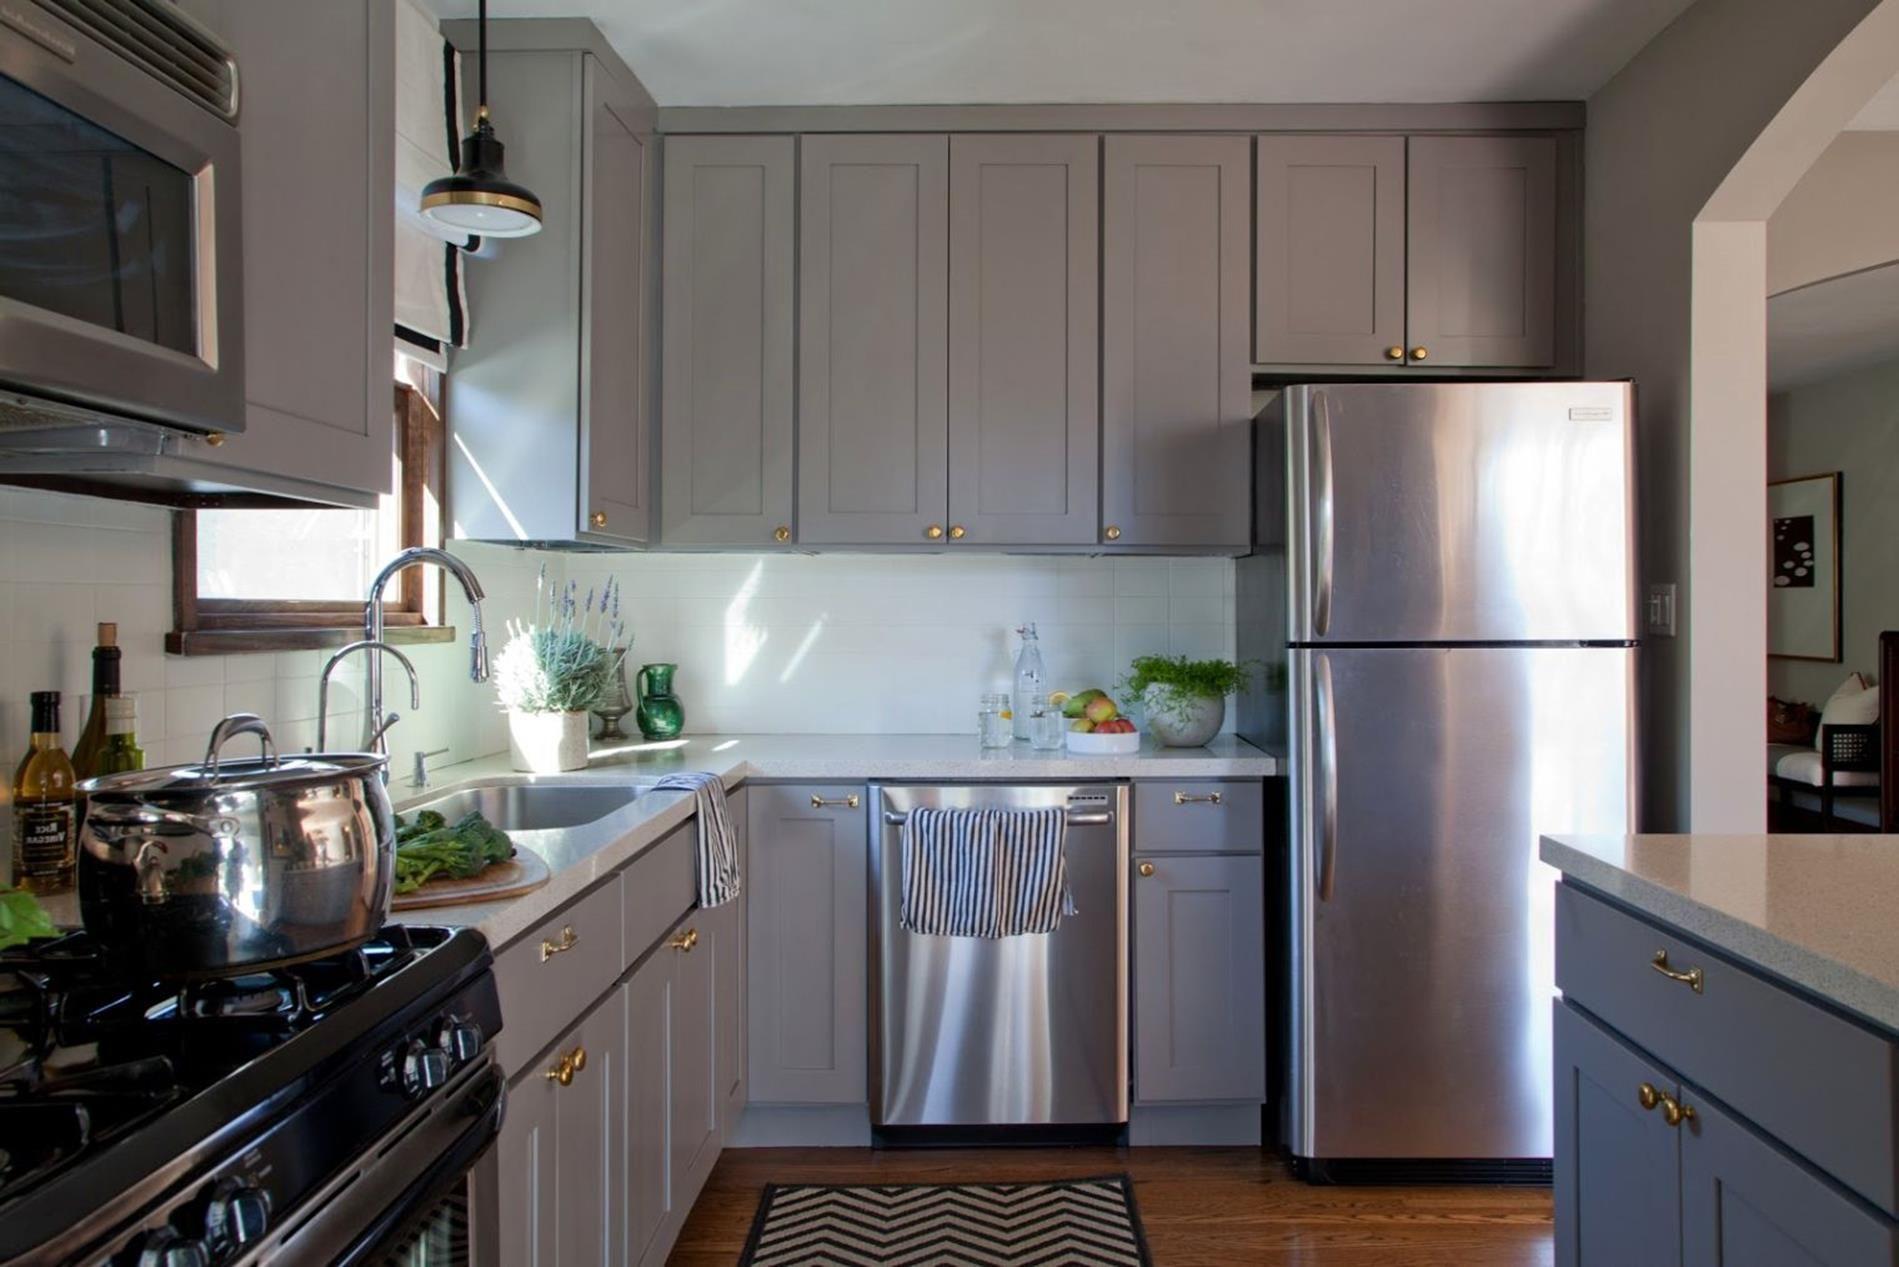 Light Grey Kitchen Cabinets Ideas 42 In 2020 Grey Kitchen Cabinets Kitchen Cabinet Design Grey Kitchen Colors